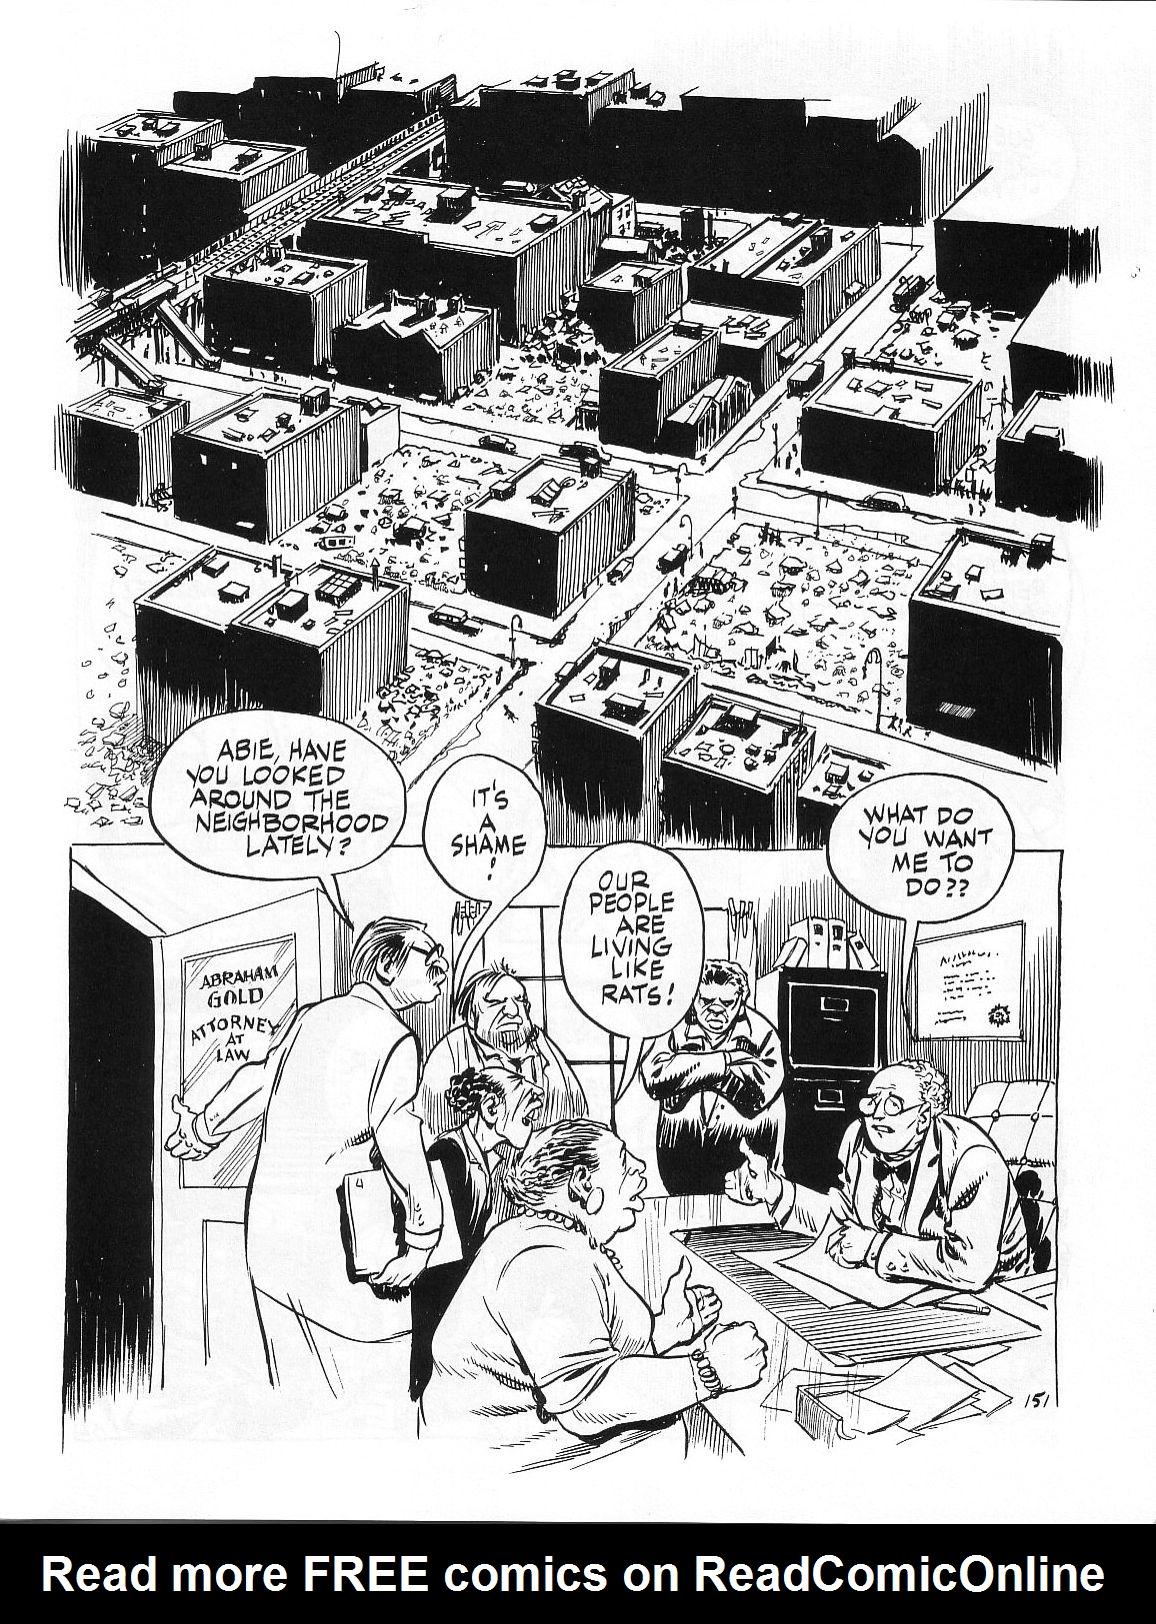 Read online Dropsie Avenue, The Neighborhood comic -  Issue # Full - 153